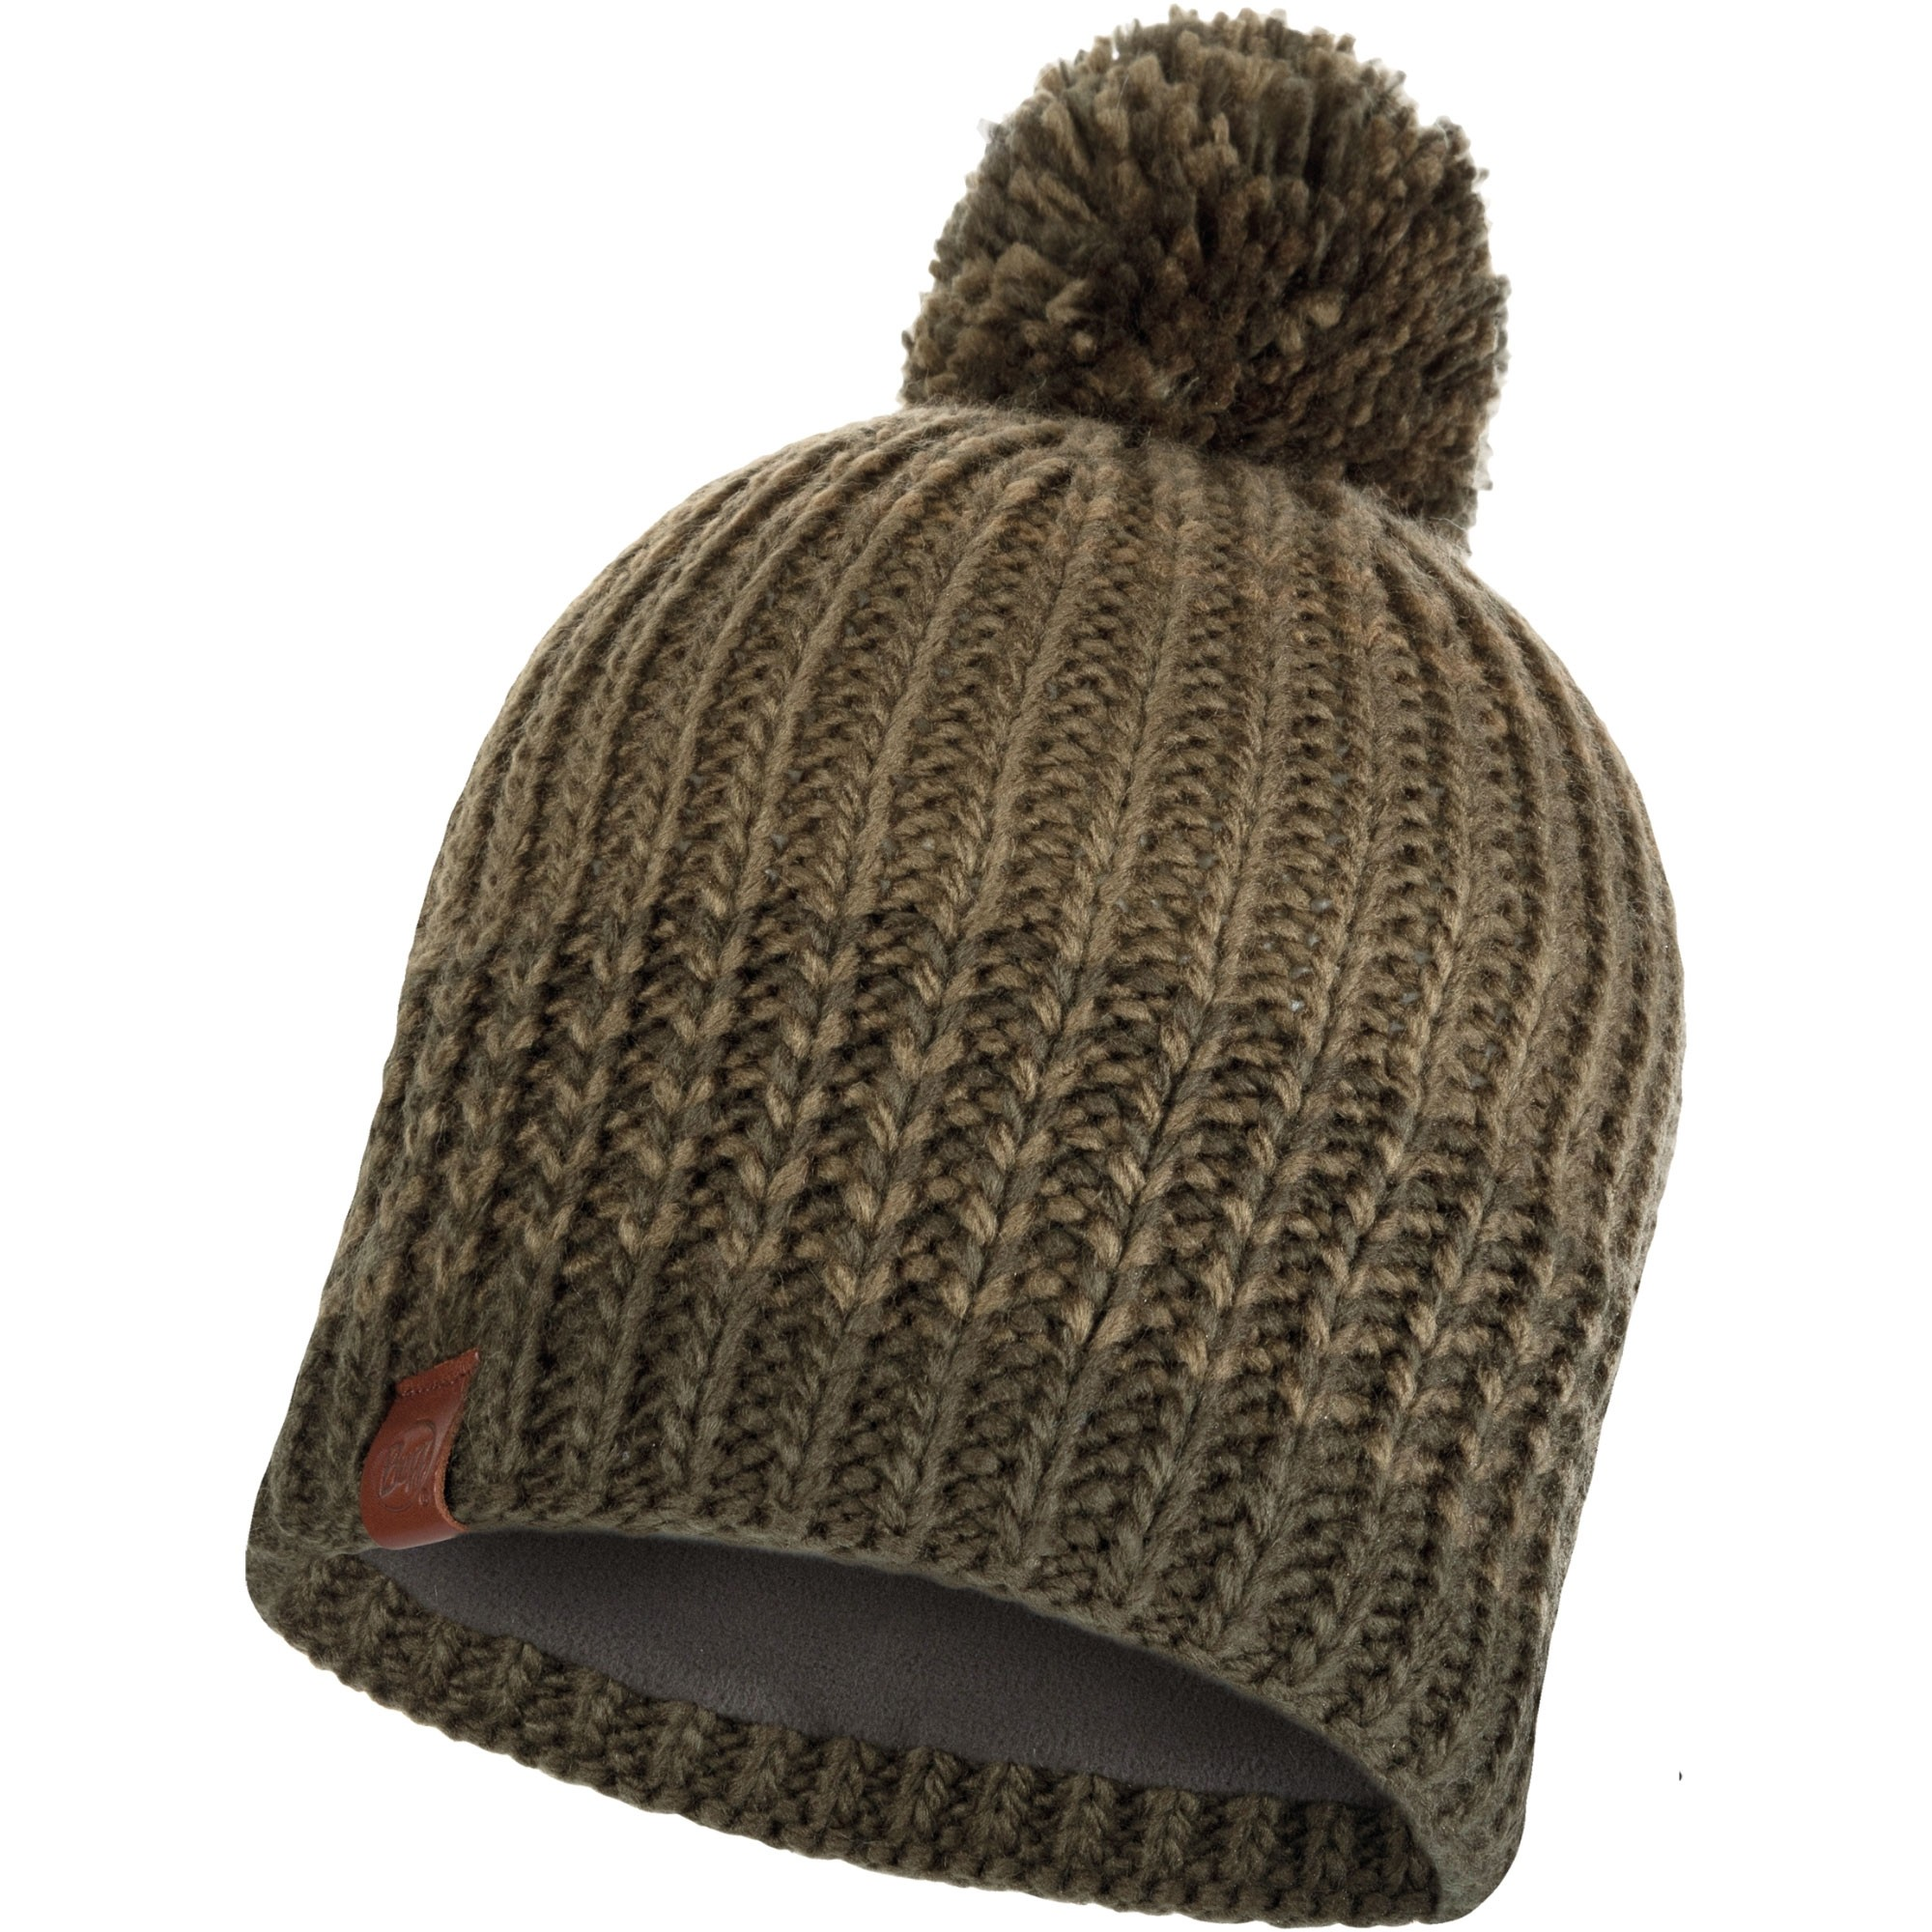 Buff Borae Knitted Hat - Khaki